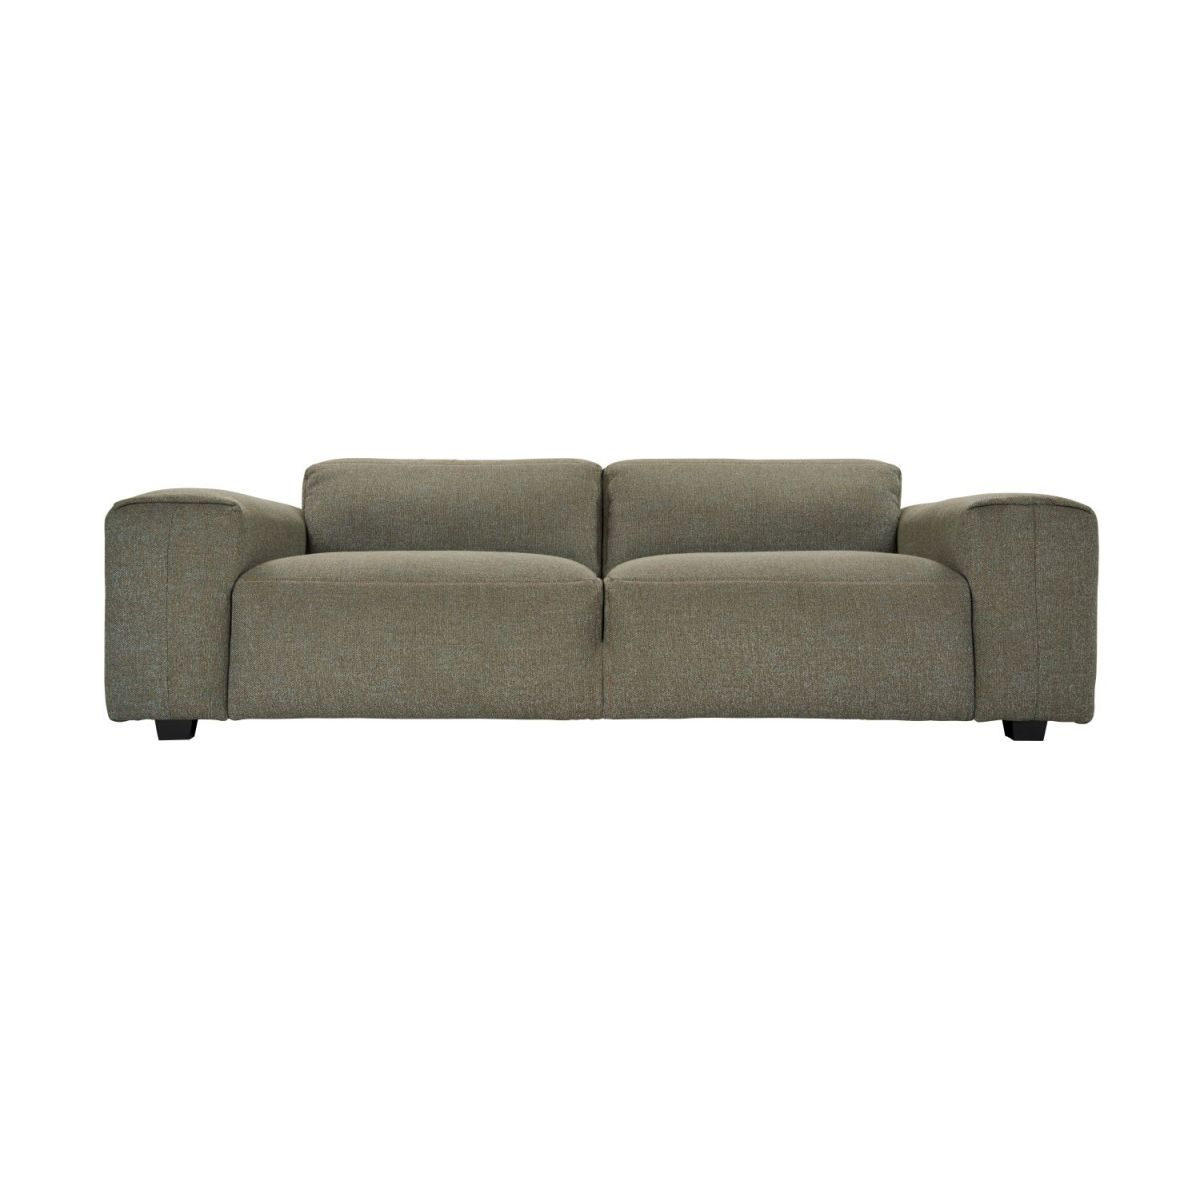 Sofas De 4 Plazas Rldj Posada sofà 4 Plazas De Tela Lecce Slade Grey Habitat